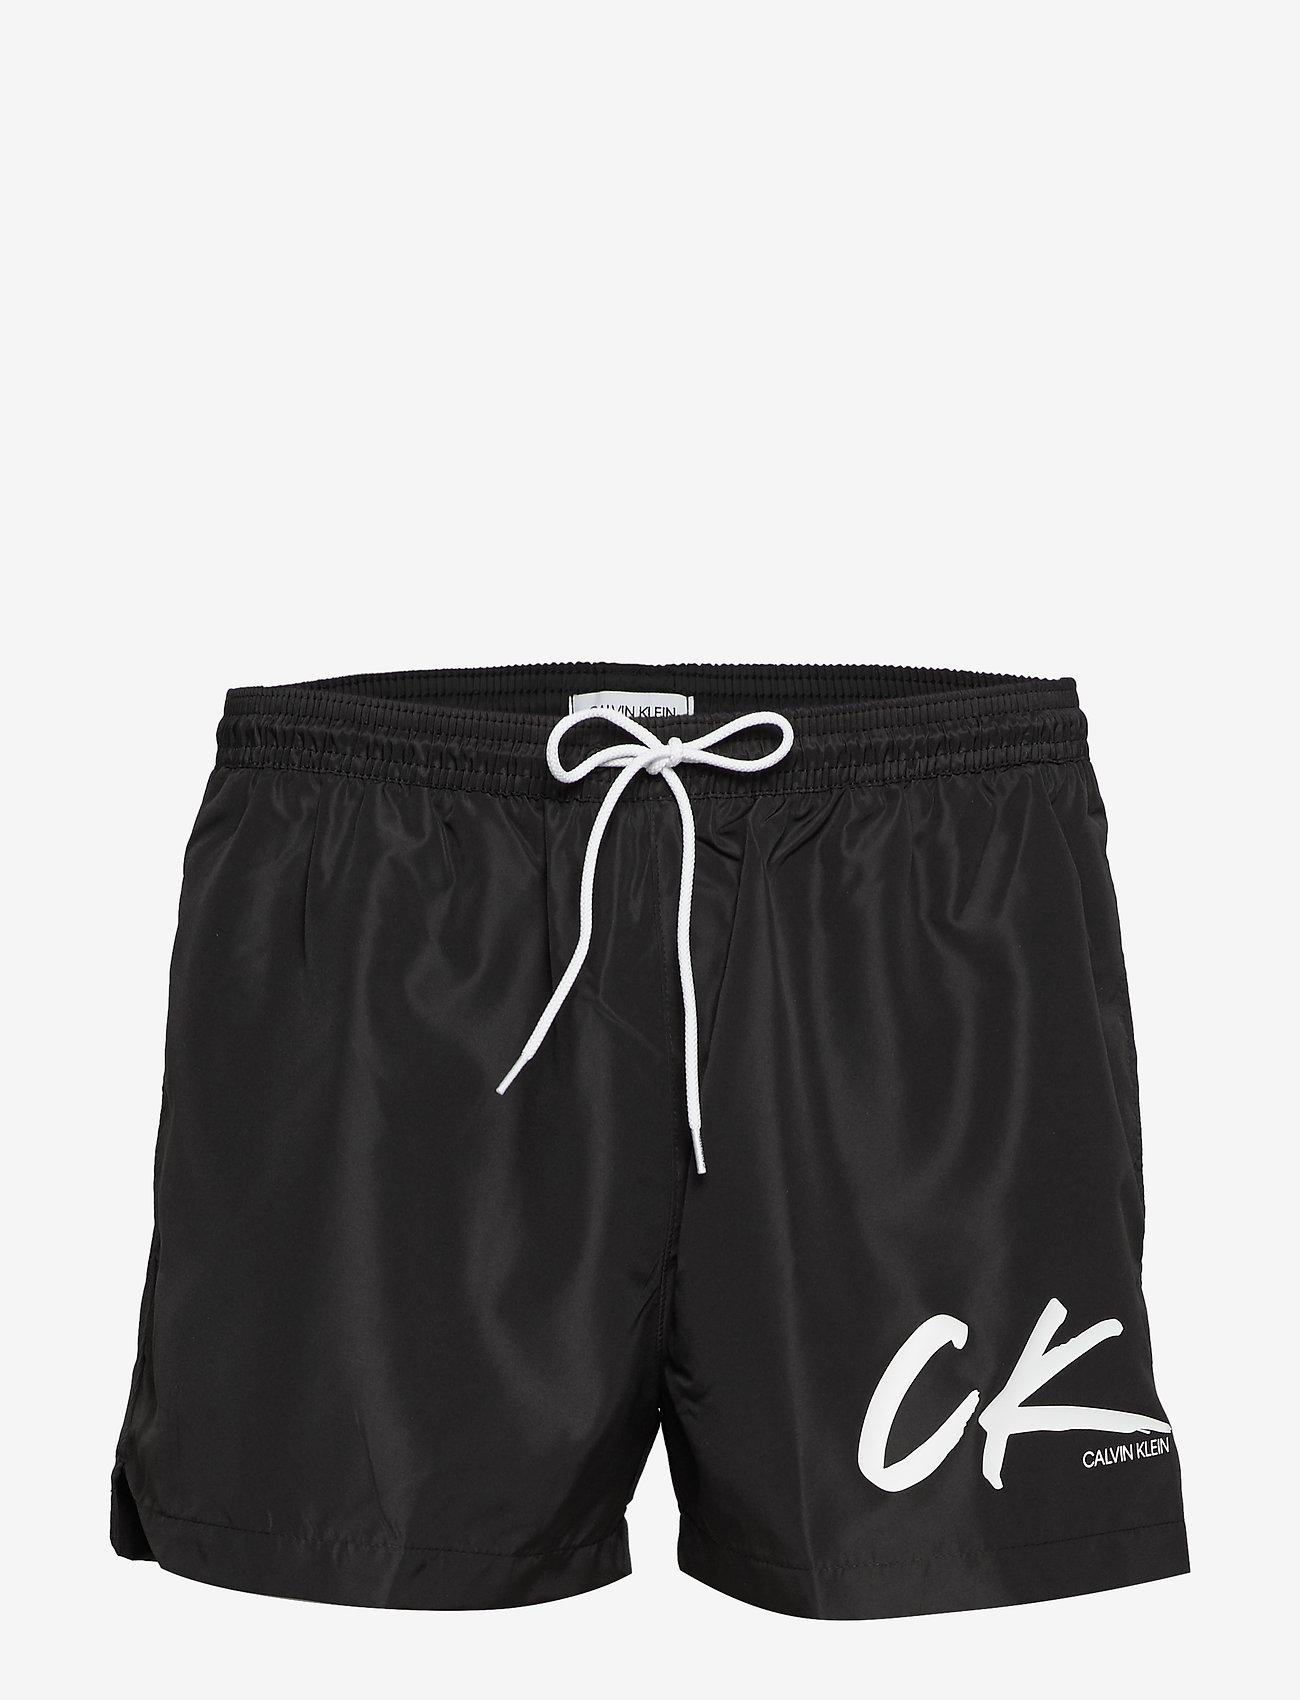 Calvin Klein - SHORT DRAWSTRING - badehosen - pvh black - 0